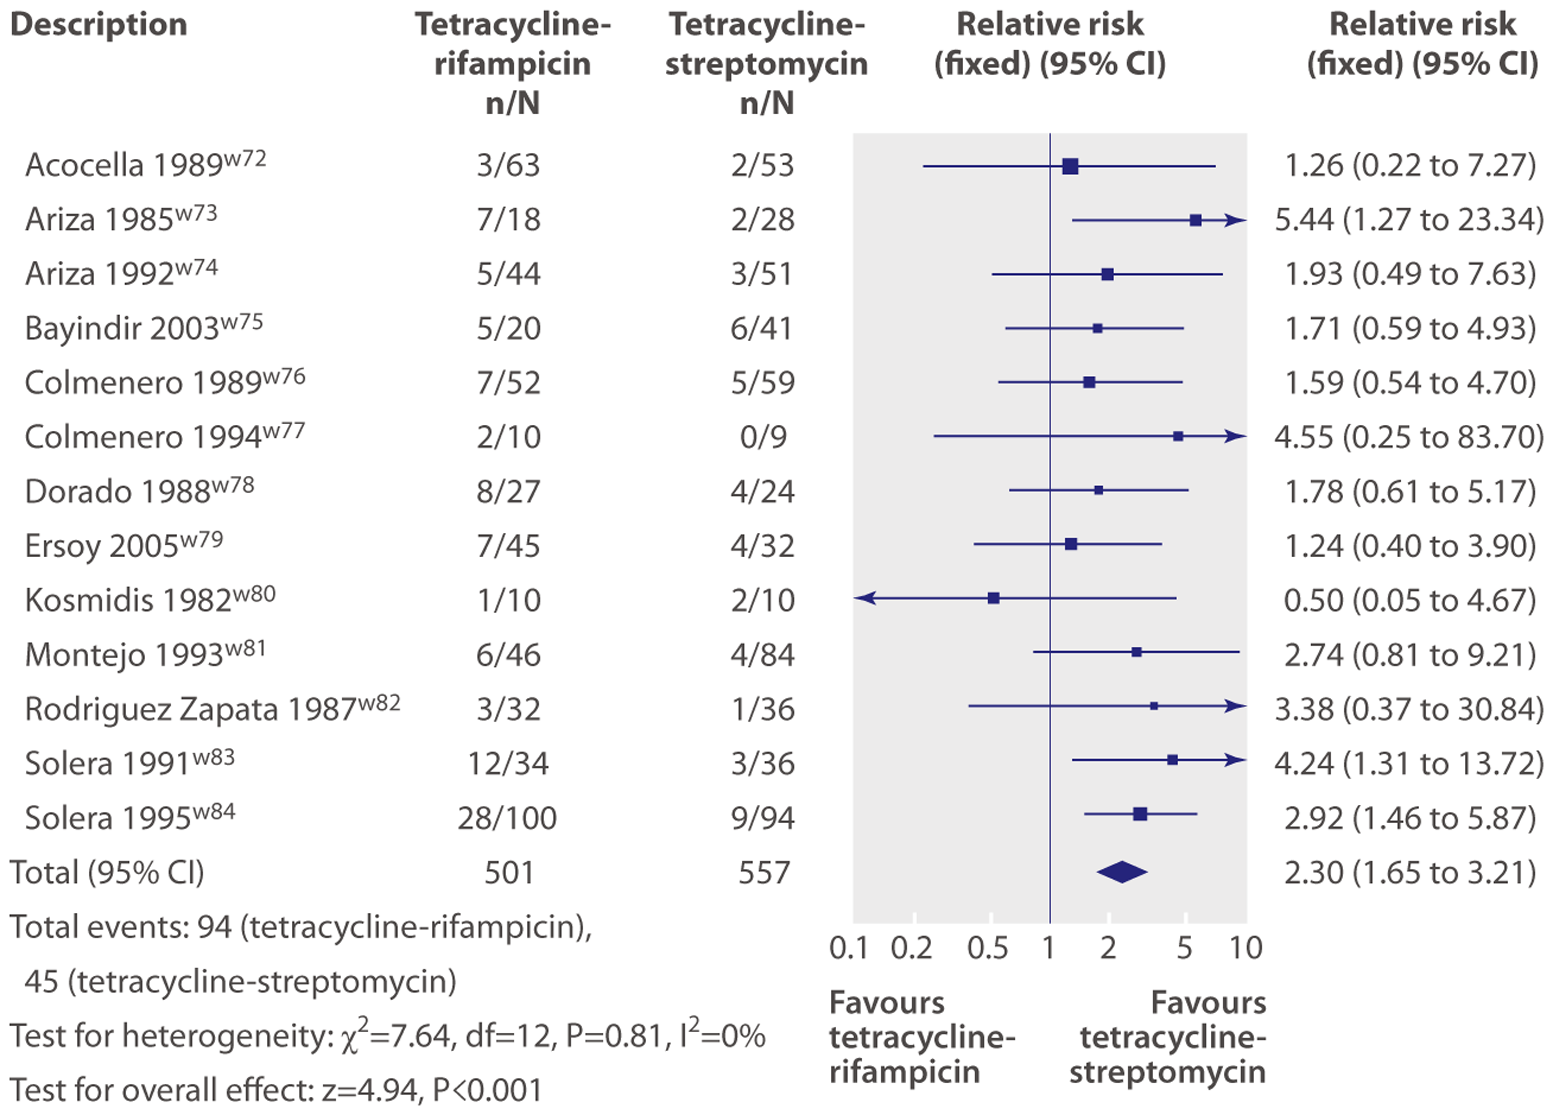 Example Figure: Overall failure (defined as failure of assigned regimen or relapse) with tetracycline-rifampicin versus tetracycline-streptomycin.